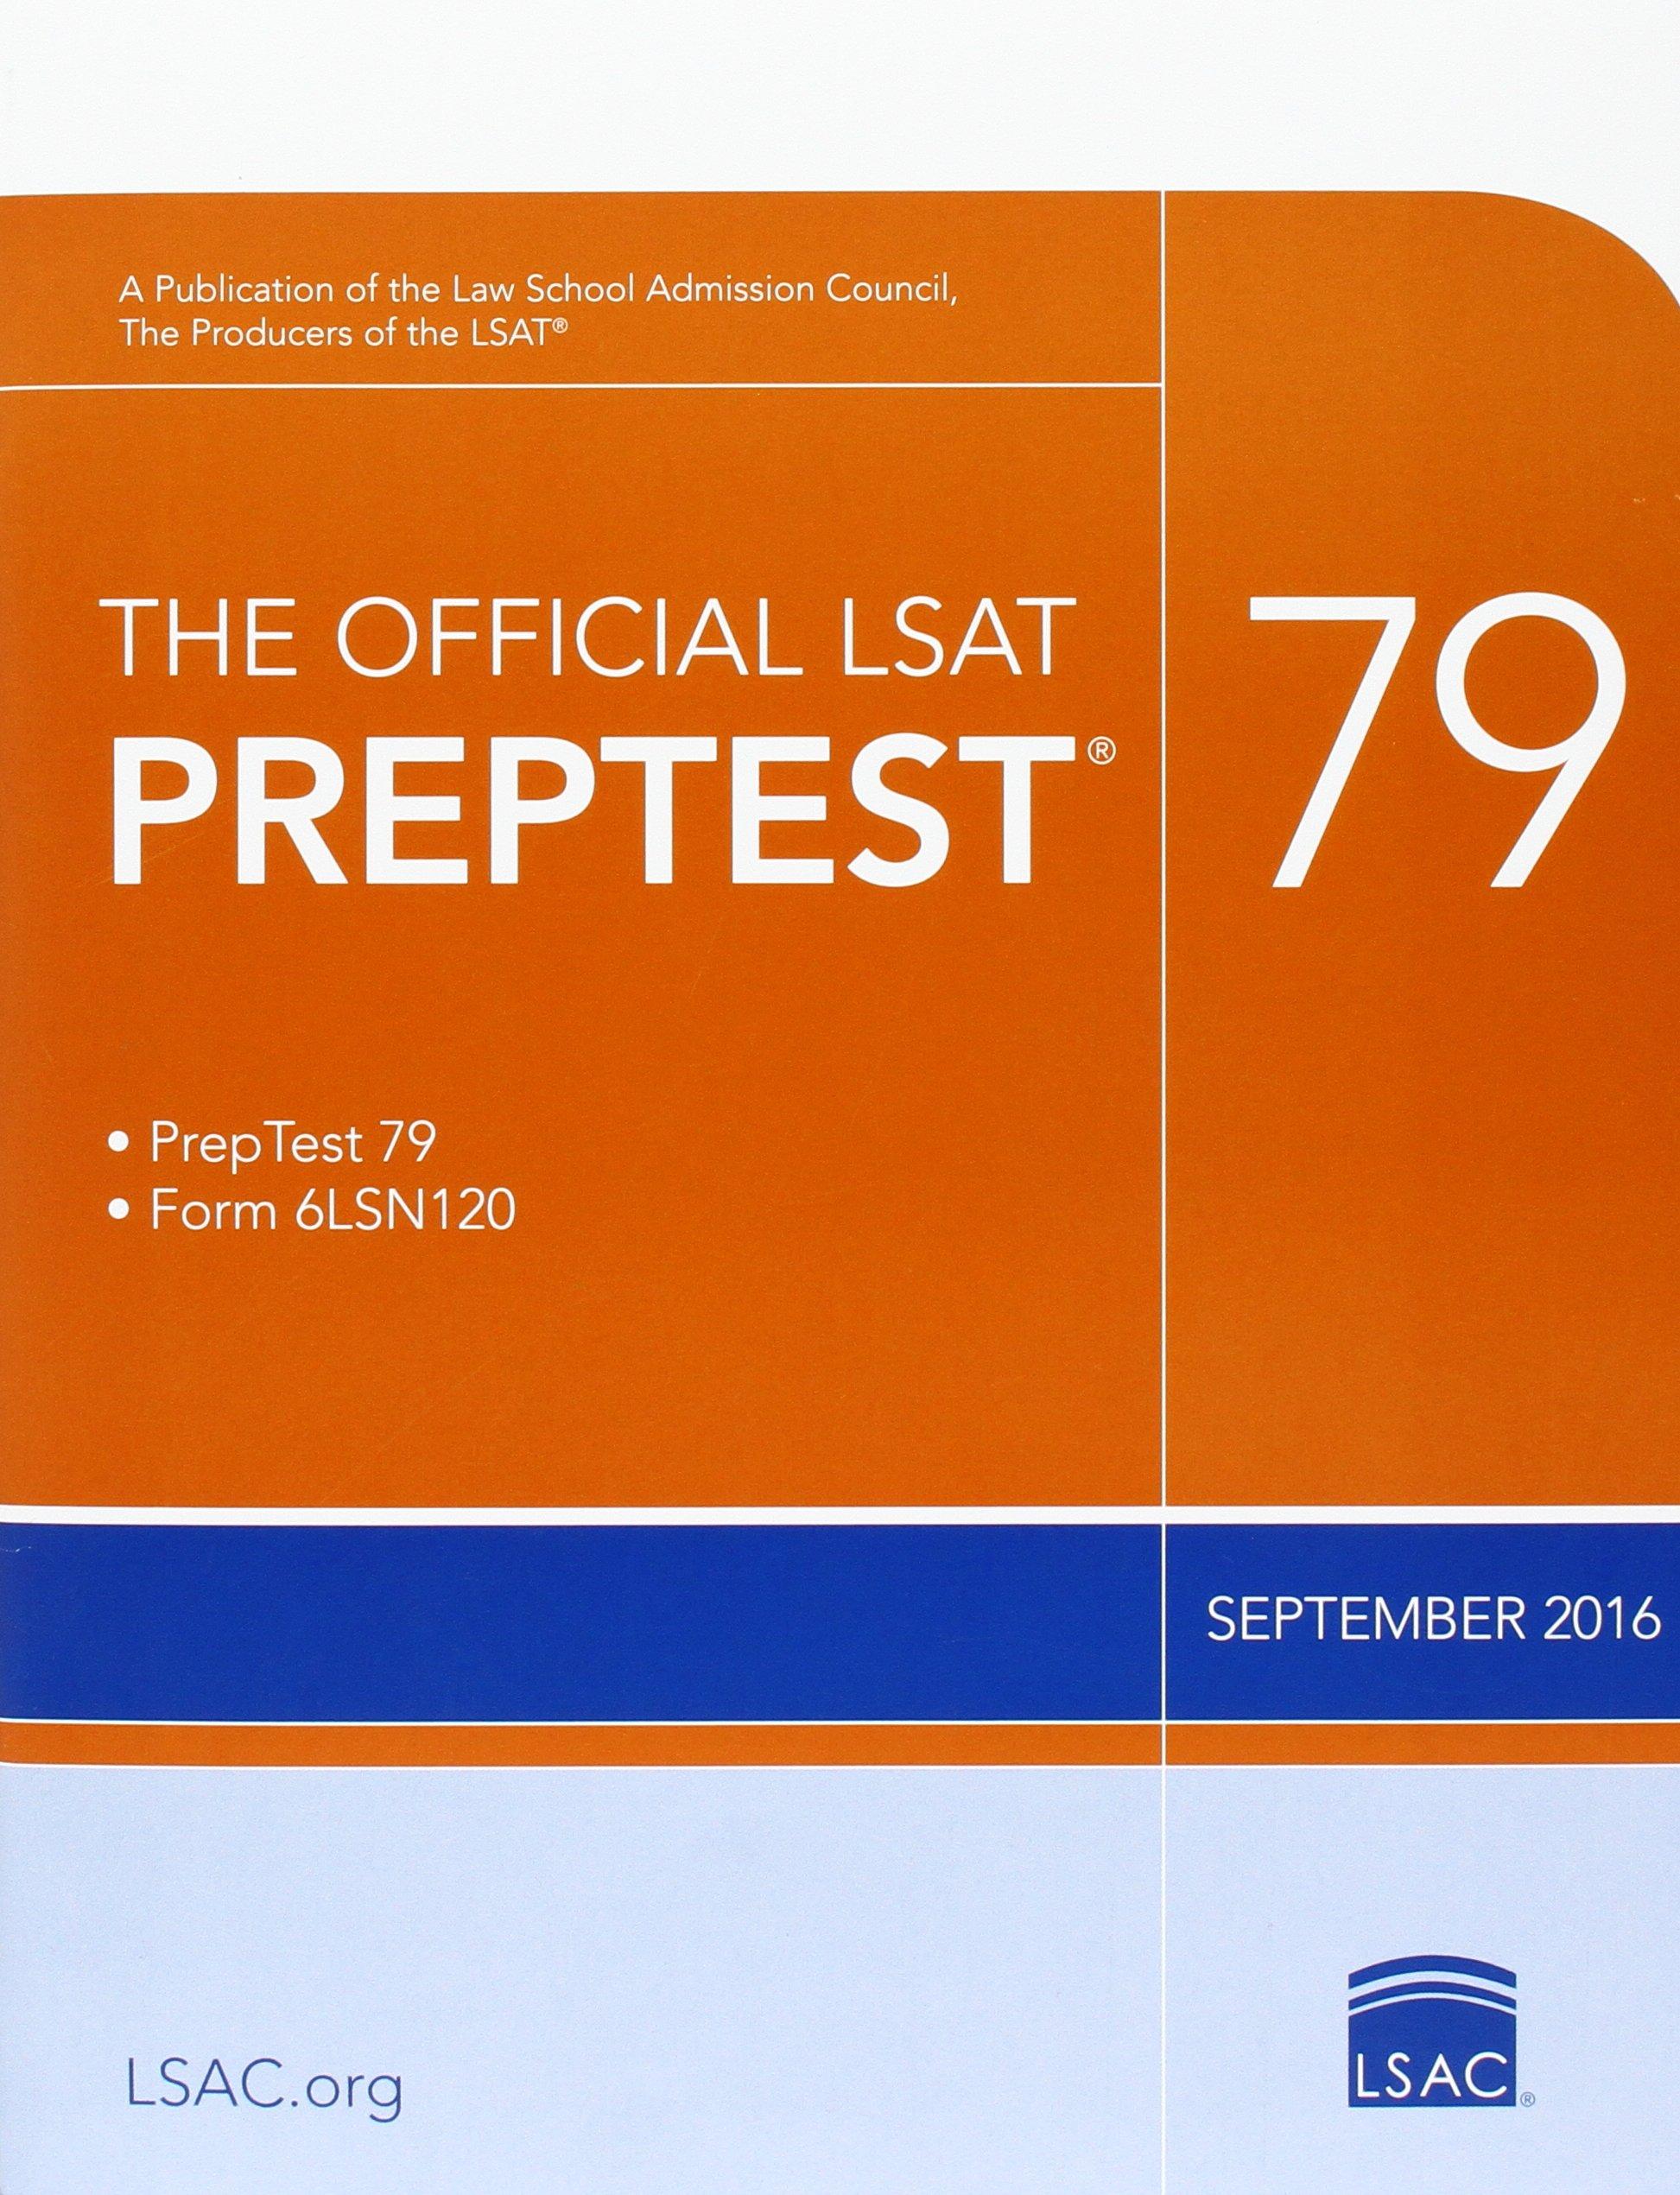 The Official LSAT PrepTest 79: (Sept. 2016 LSAT)